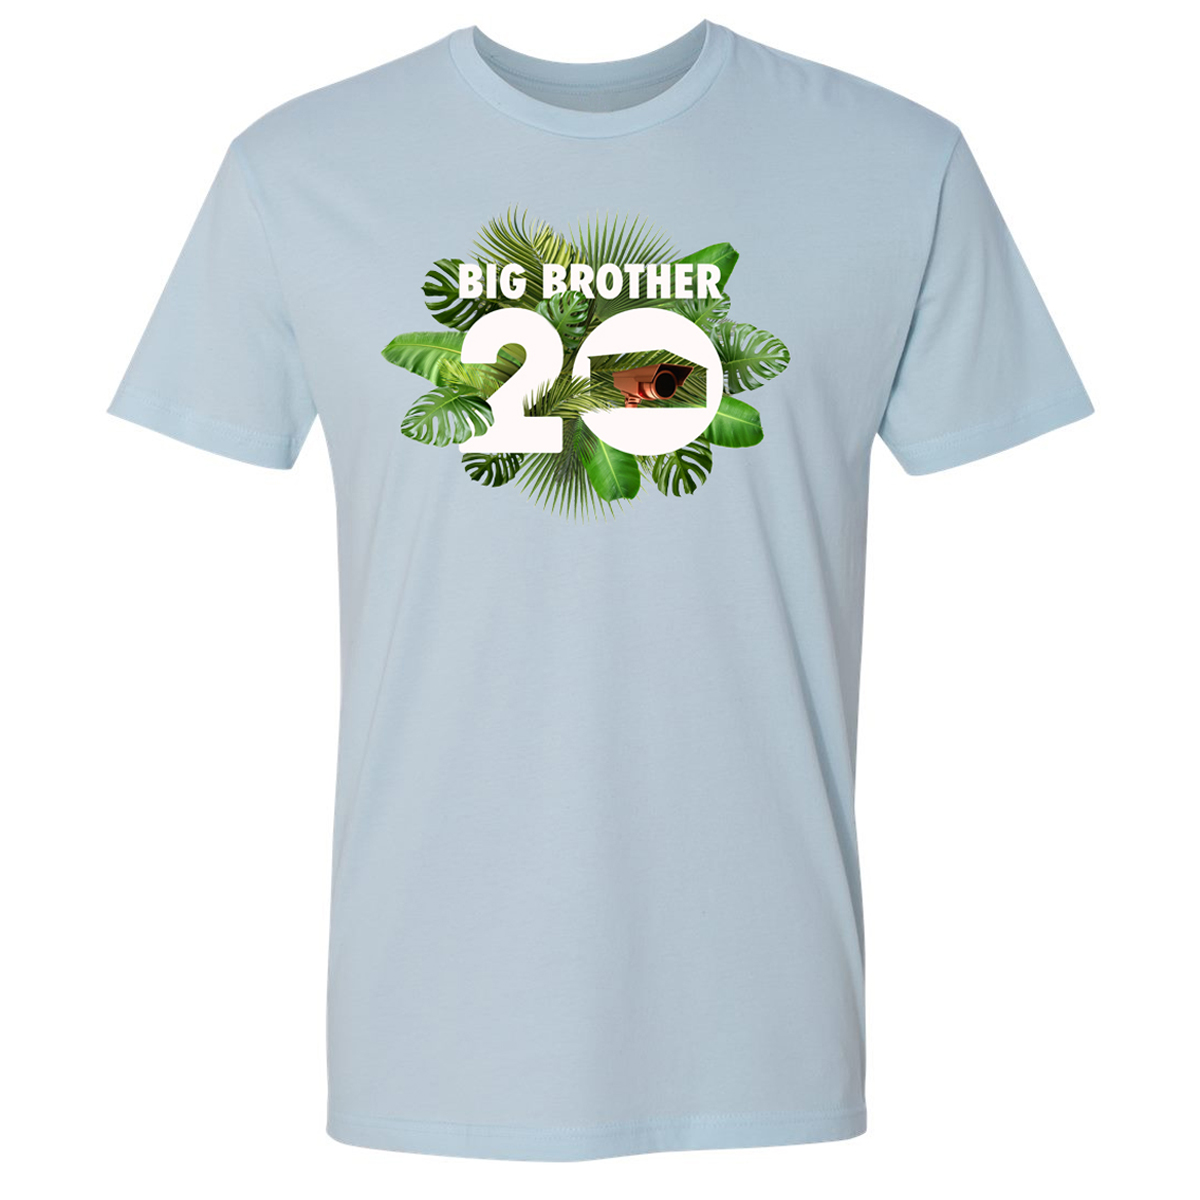 Big Brother 20 Logo Palm T-Shirt